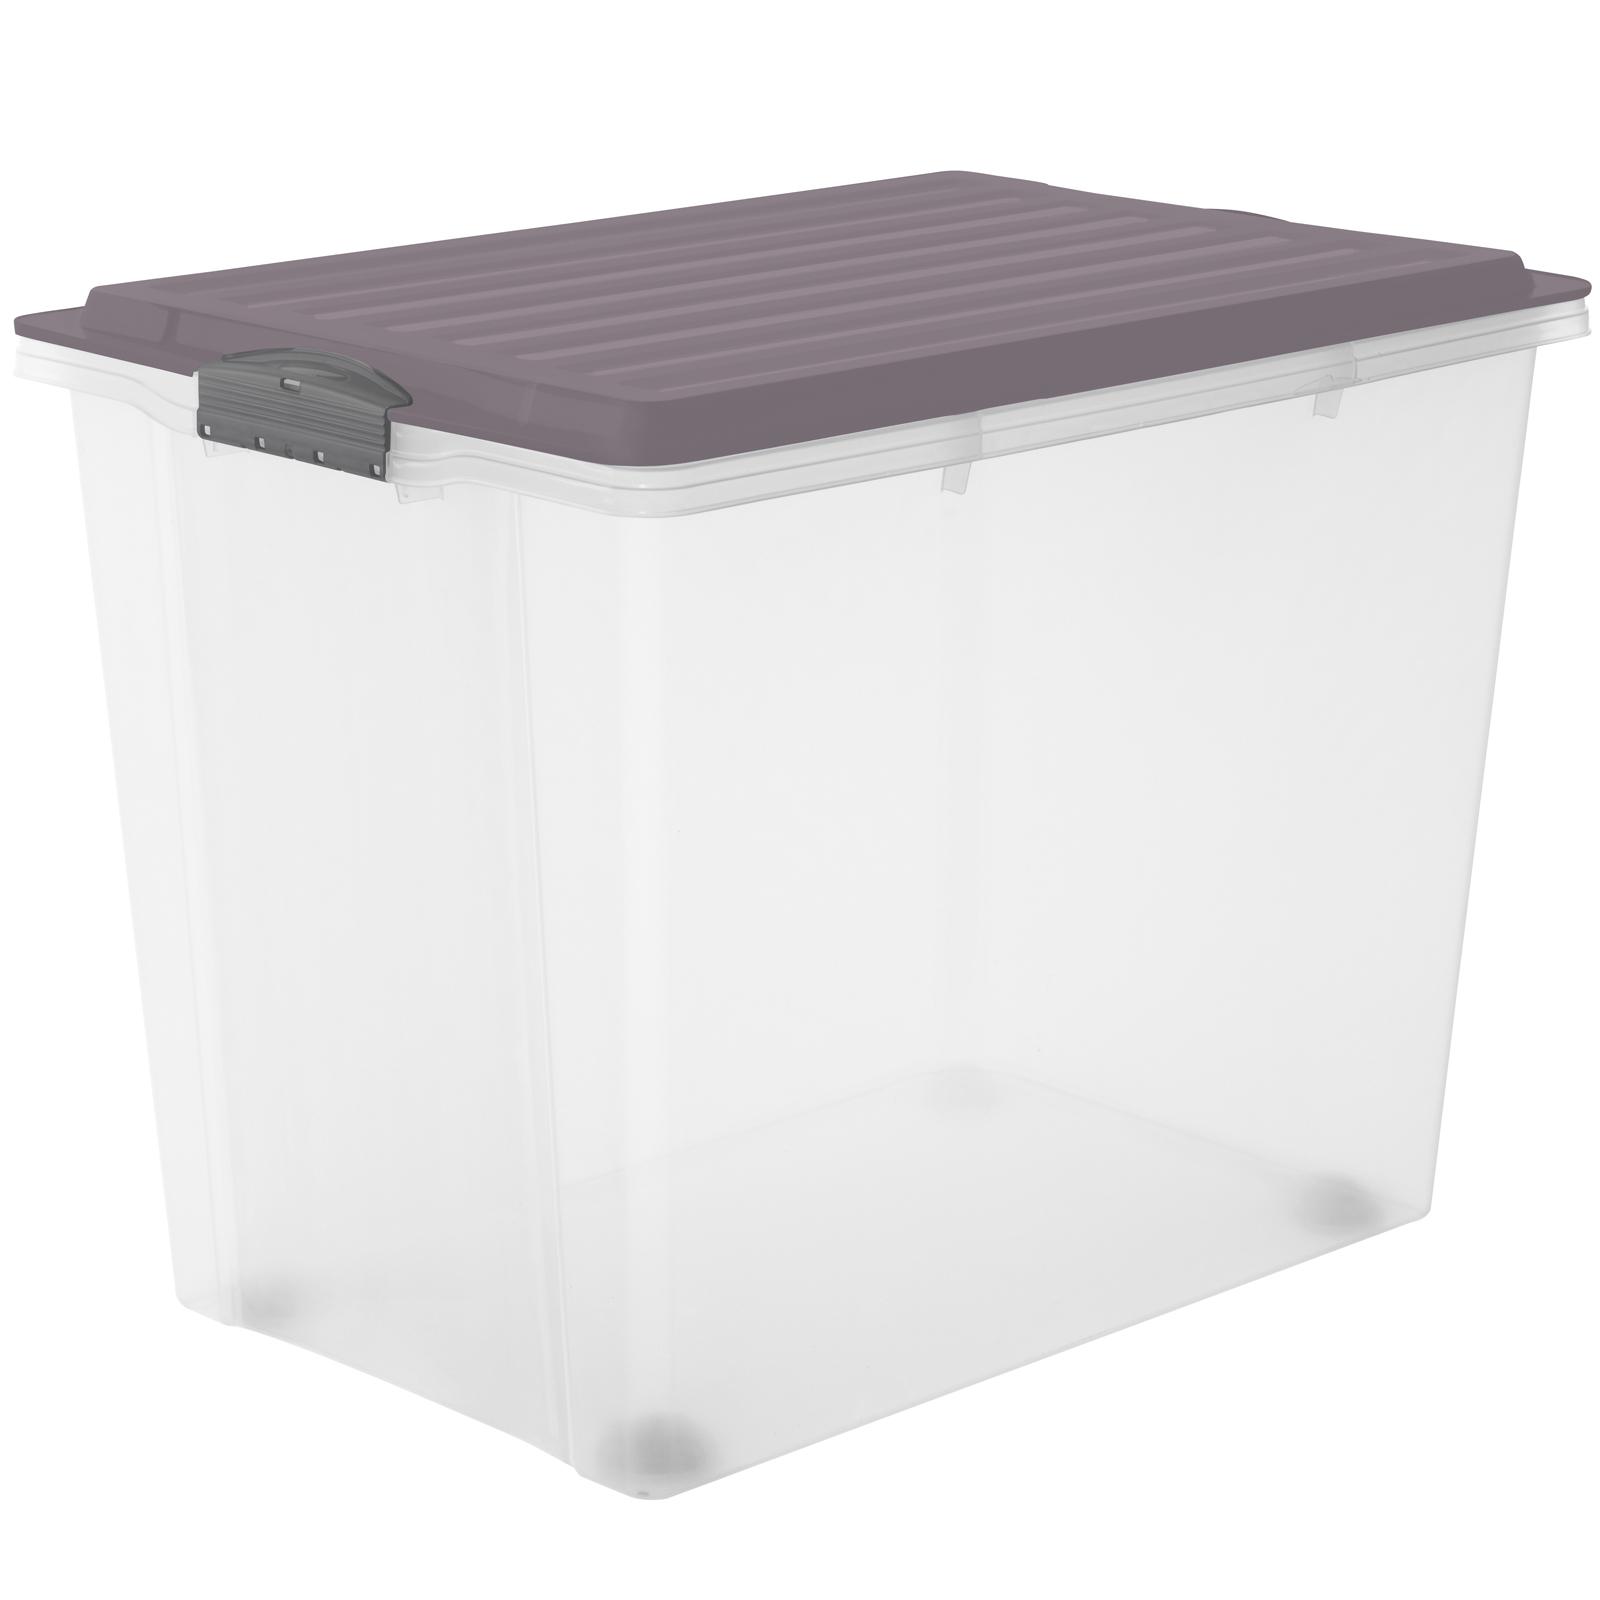 Stapelbox A3 mit Rollen, 70 l COMPACT